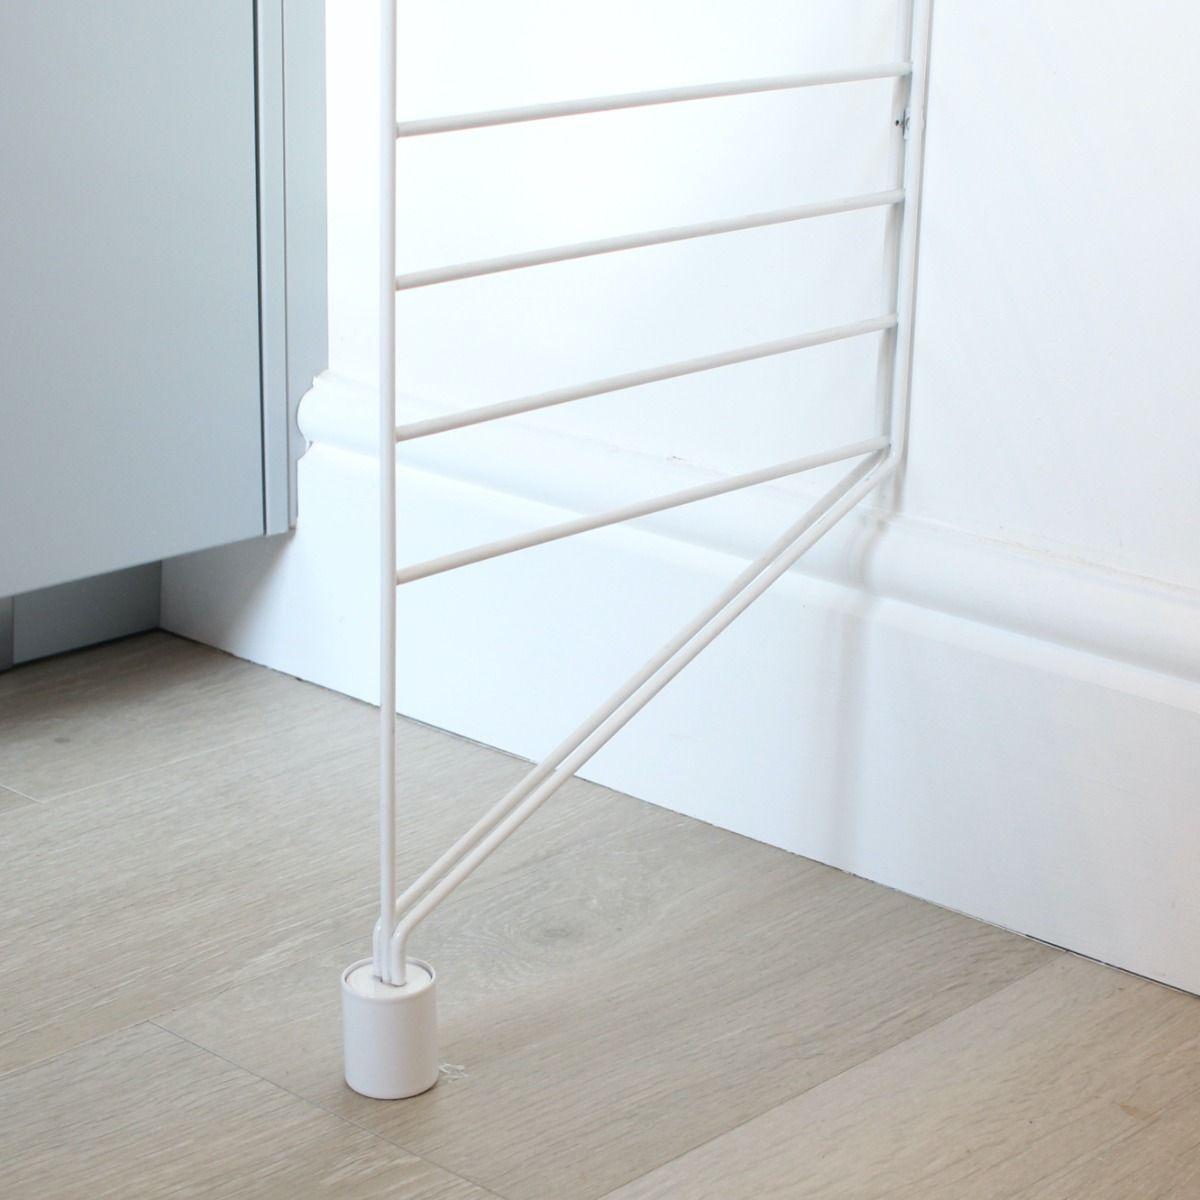 String Shelving Floor Panels Extenders 2PK in a kitchen